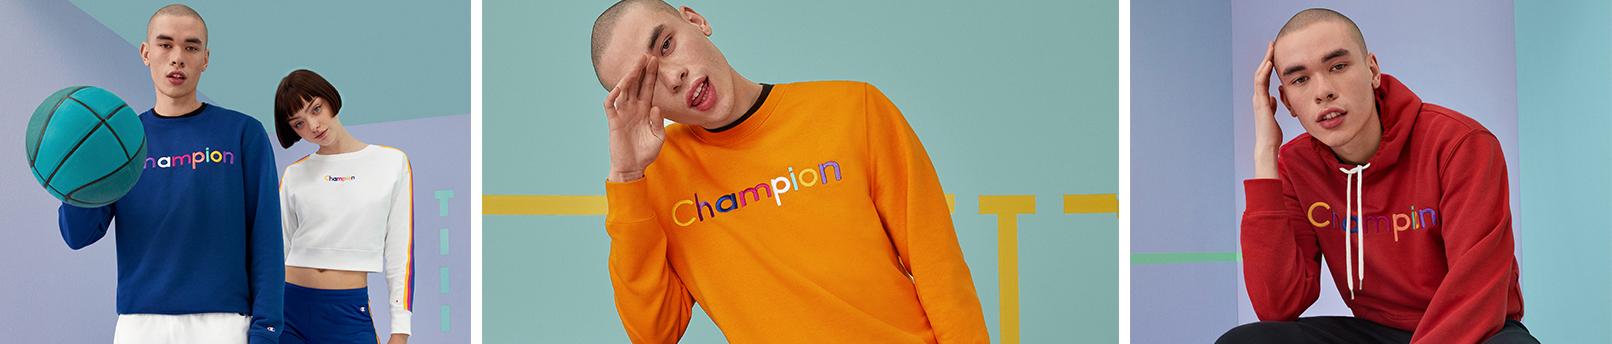 Ontdek Champion bij Zalando